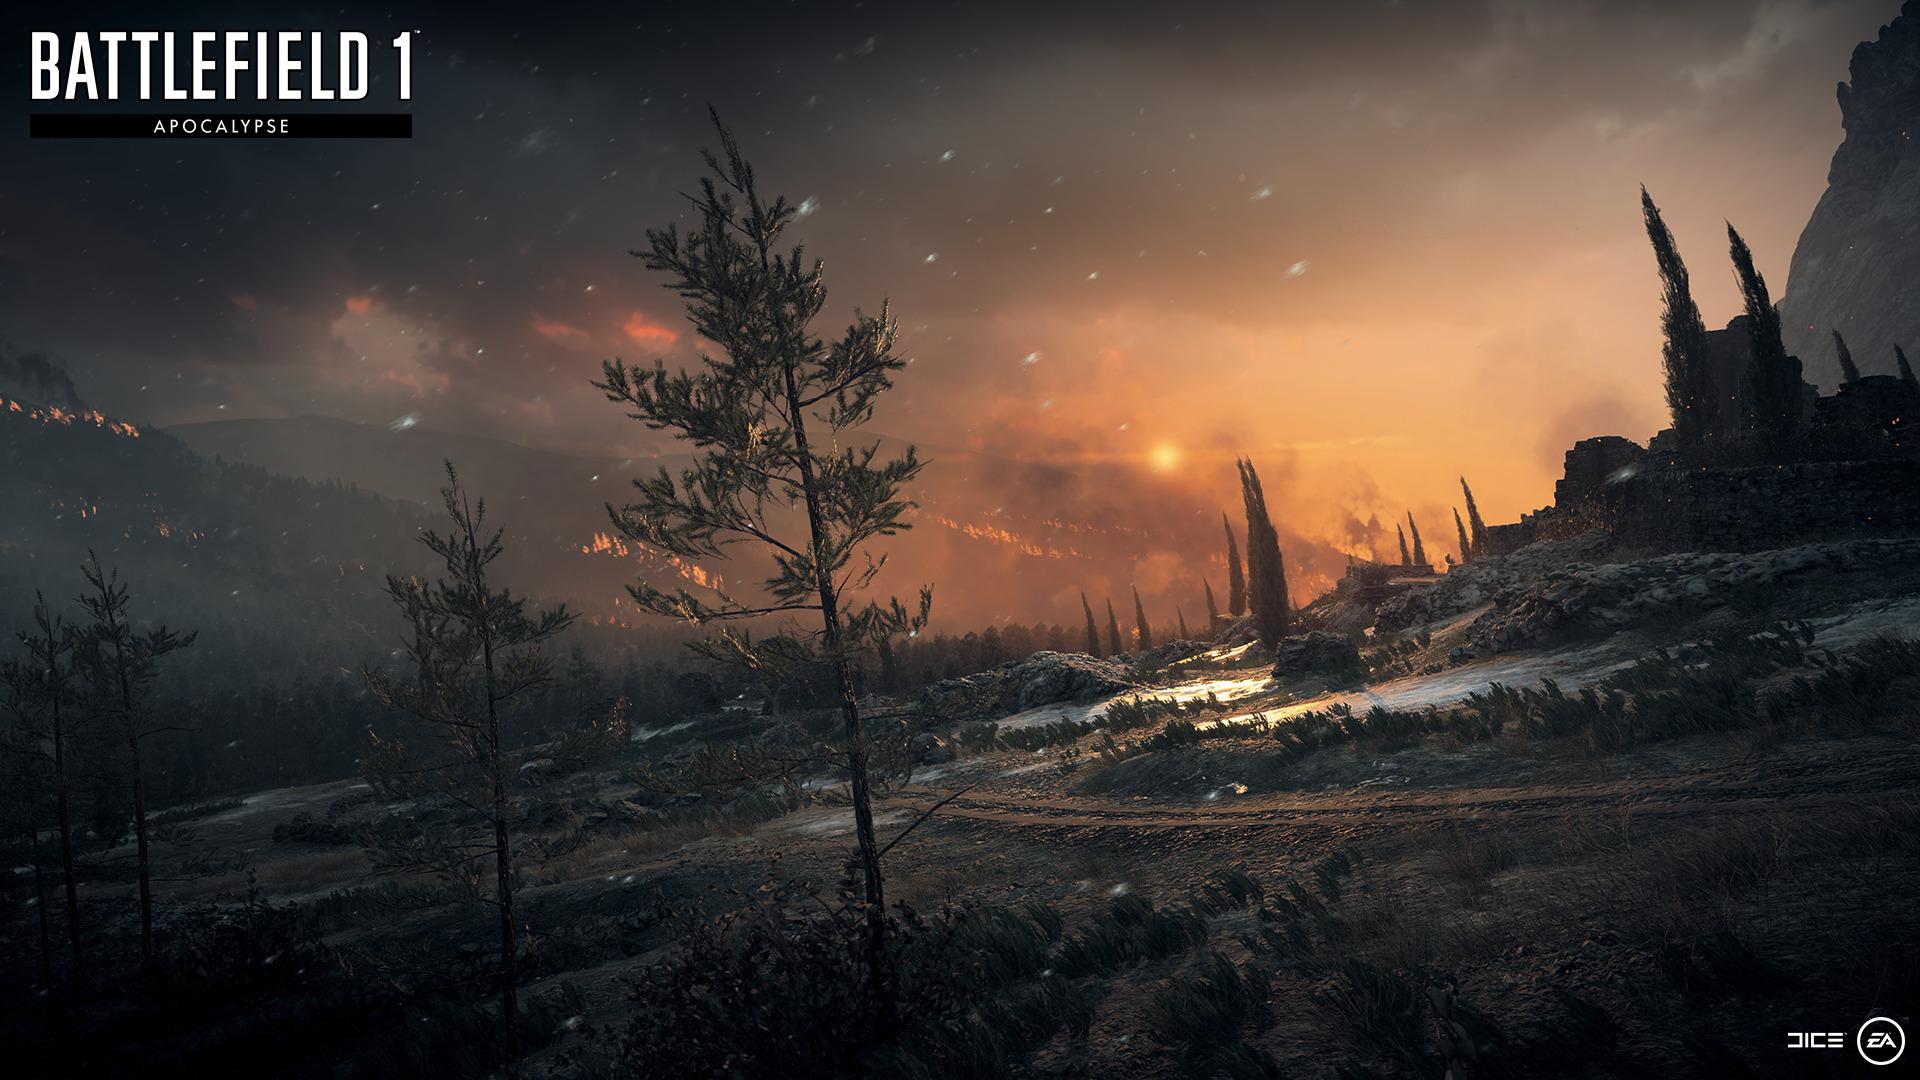 Apocalypse - Battlefield 1 DLC